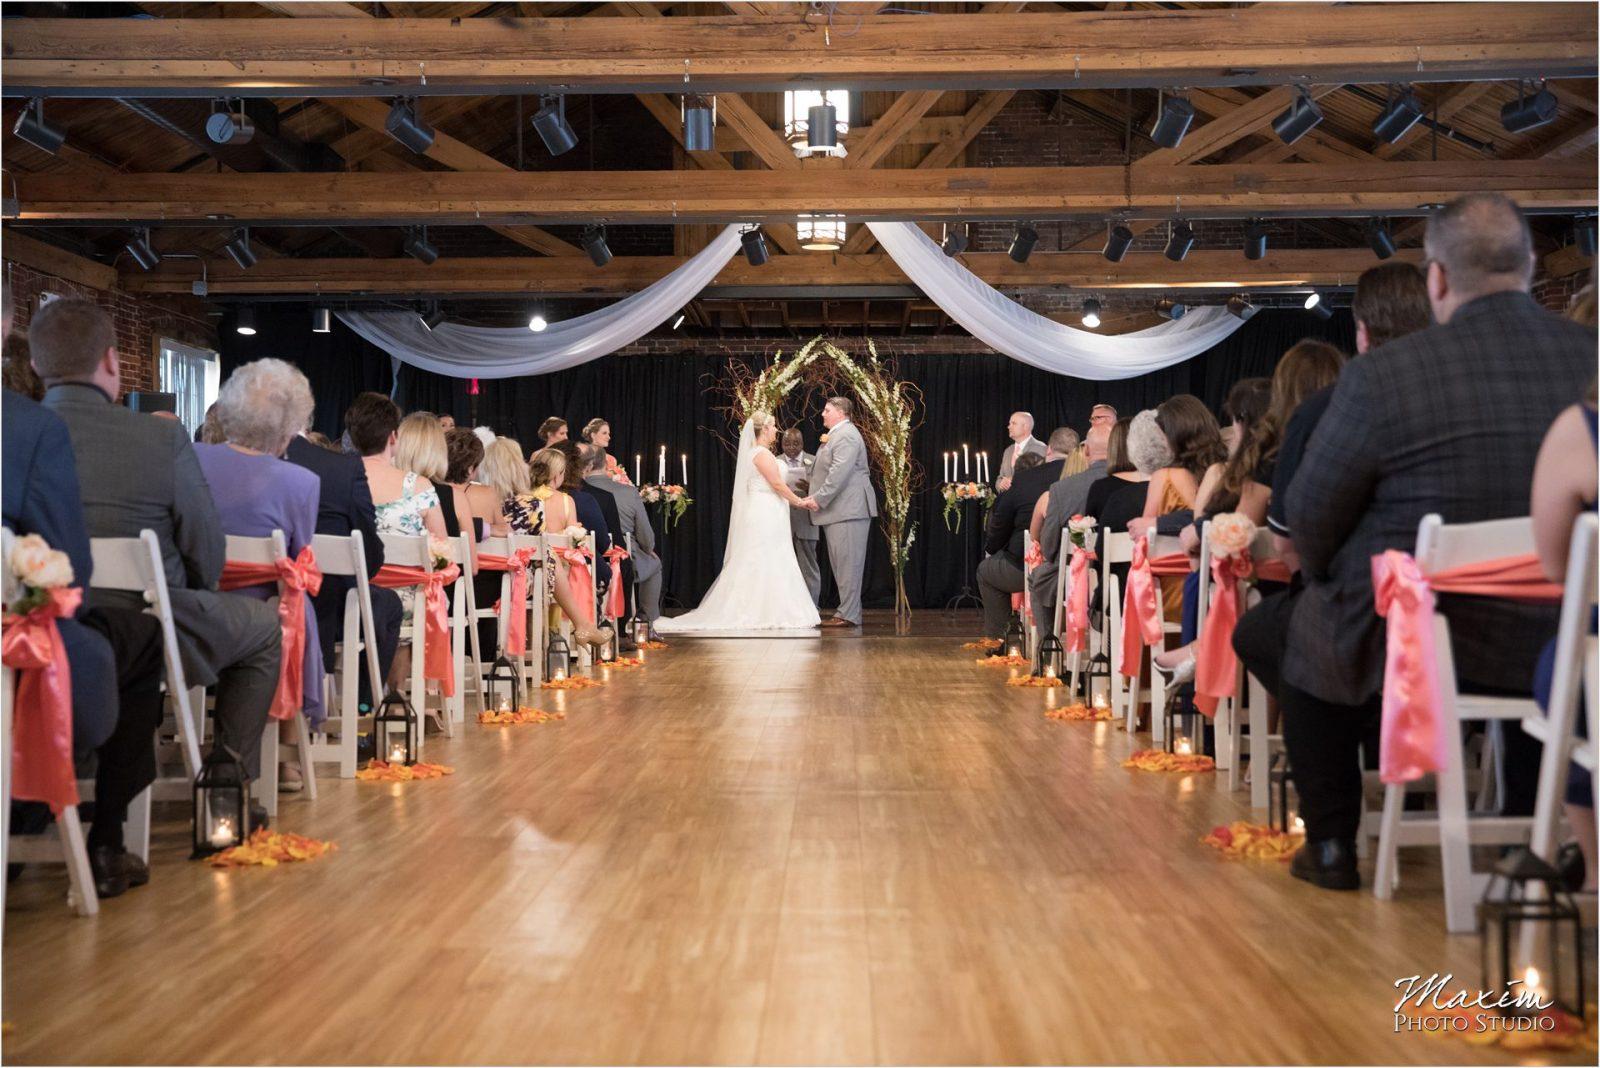 Top of the Market Dayton Ohio Wedding ceremony